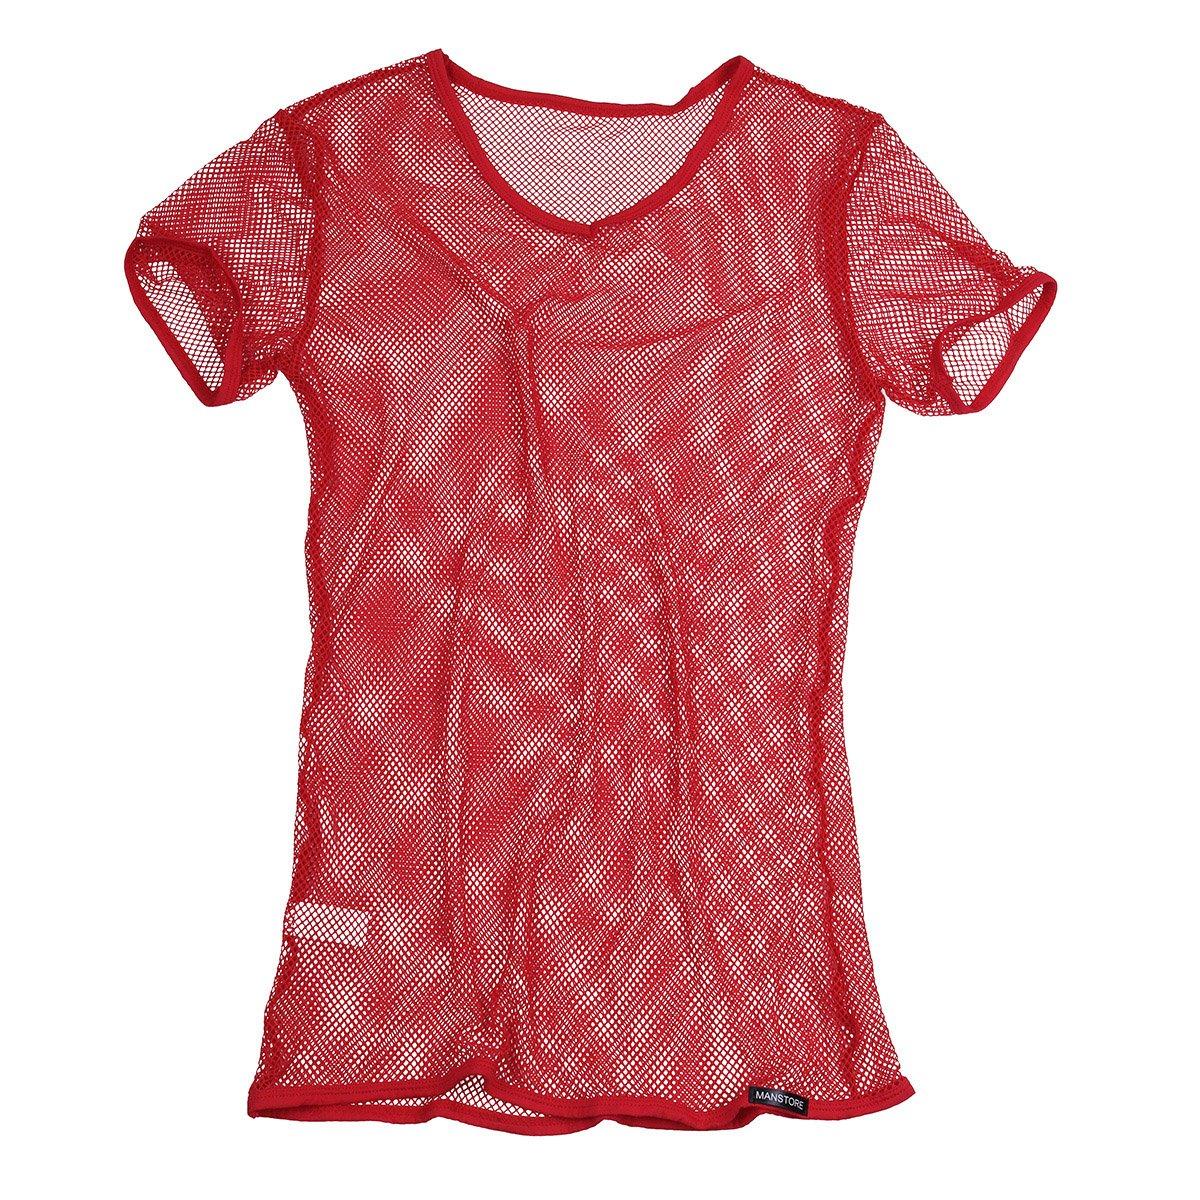 YiZYiF Men's See Through Fishnet Clubwear Short Sleeve T-Shirt Undershirt